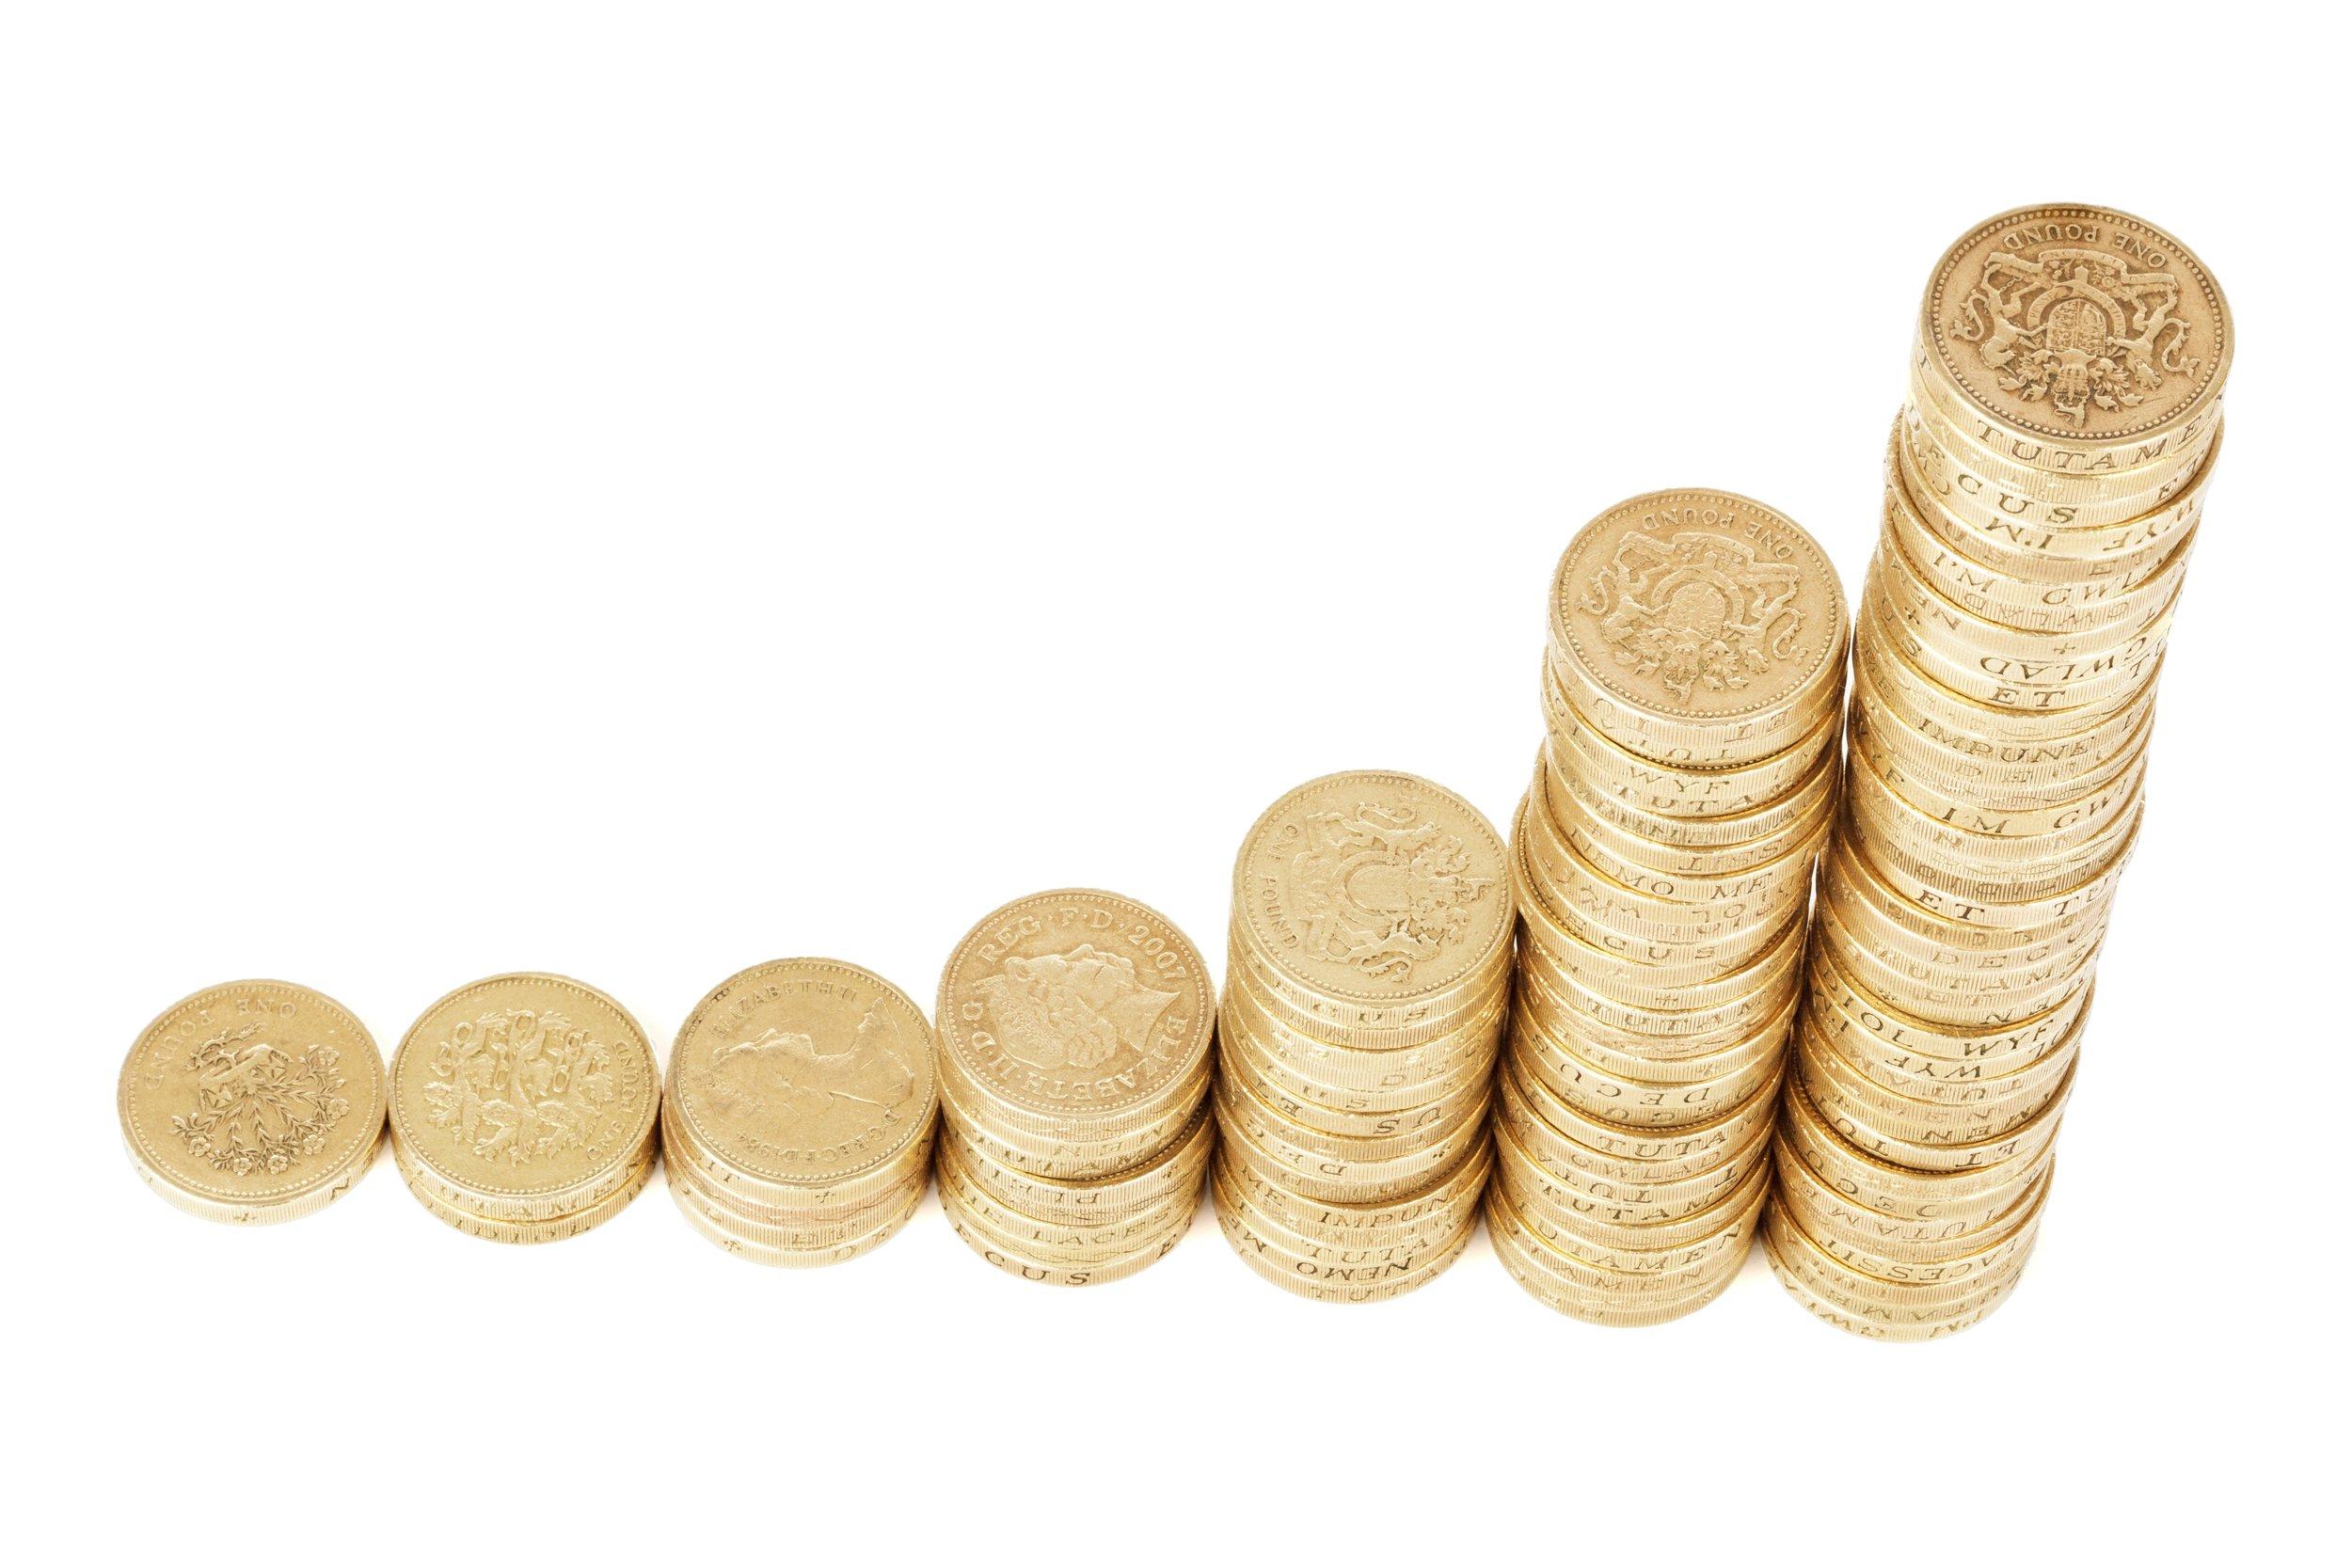 bar-british-coins-business-50545.jpg